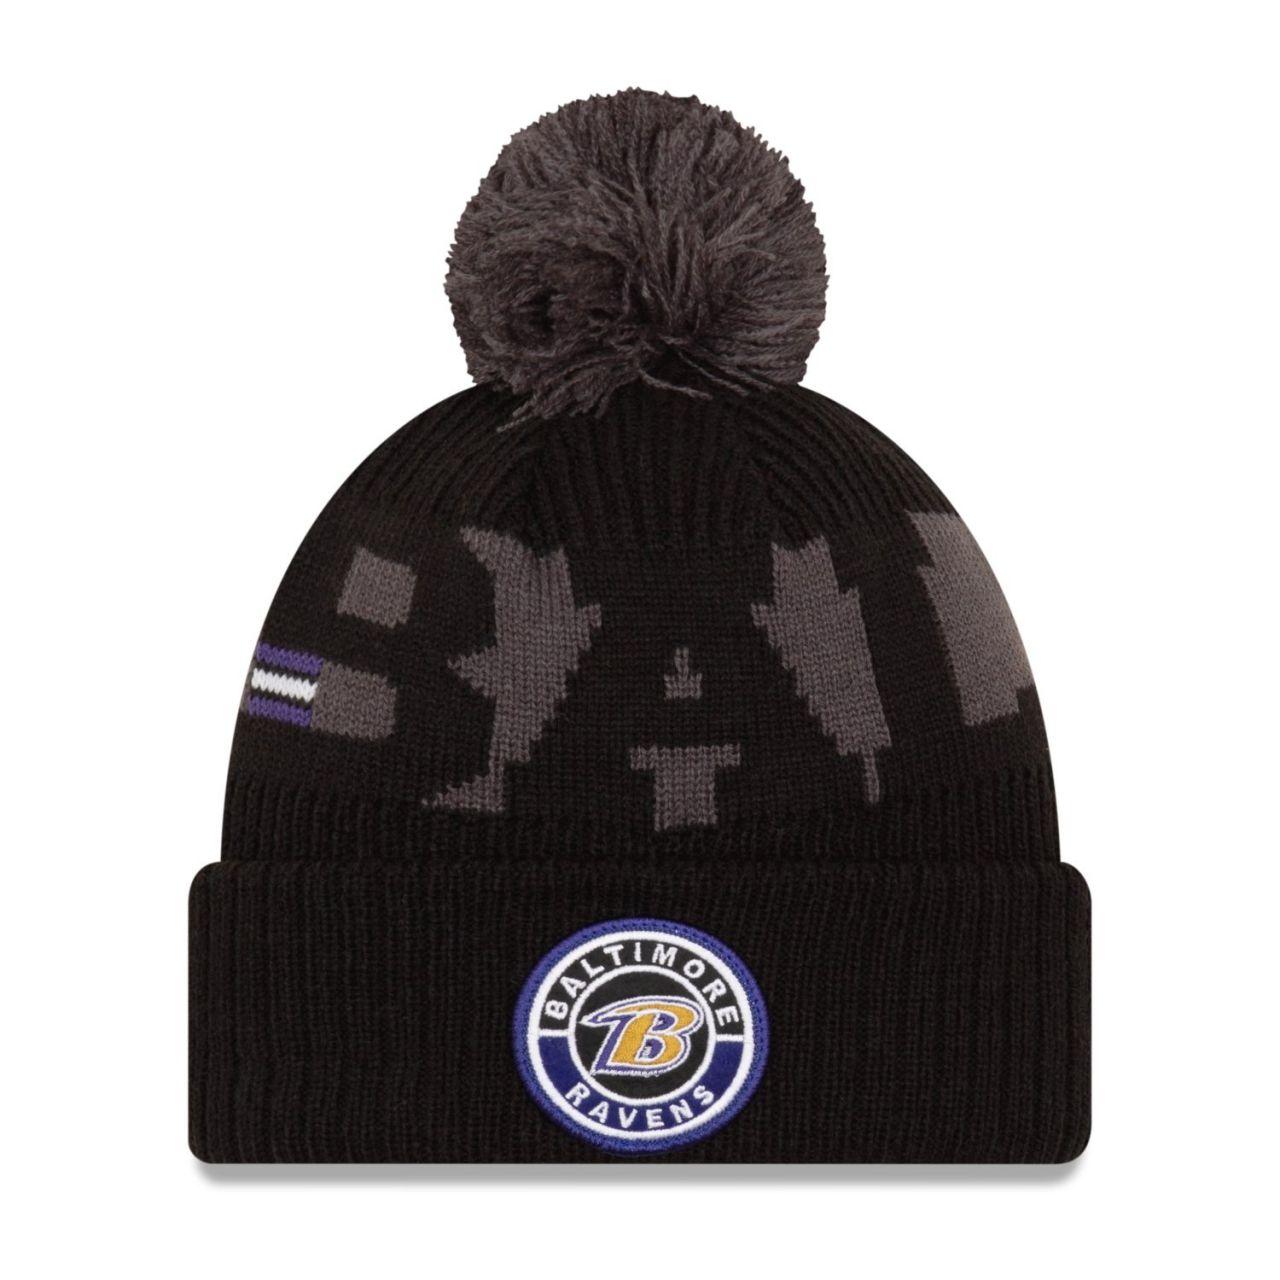 amfoo - New Era NFL ON-FIELD Sideline Kinder Mütze Baltimore Ravens